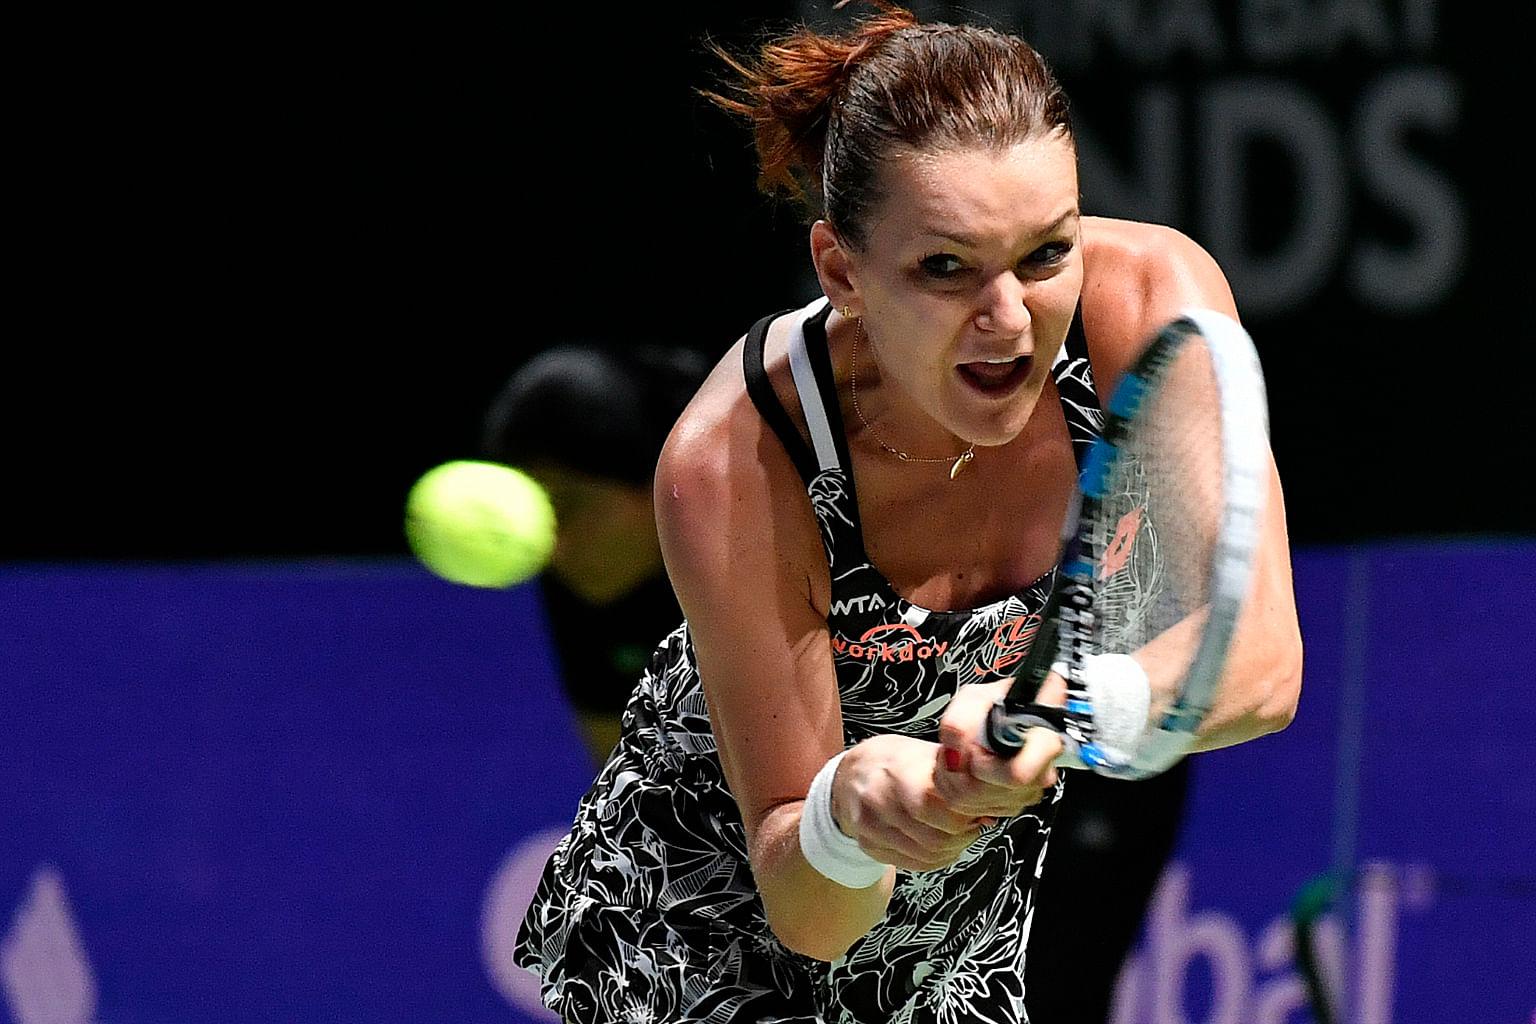 Svetlana Kuznetsova slices a backhand against Agnieszka Radwanska during her 7-5, 1-6, 7-5 victory last night.